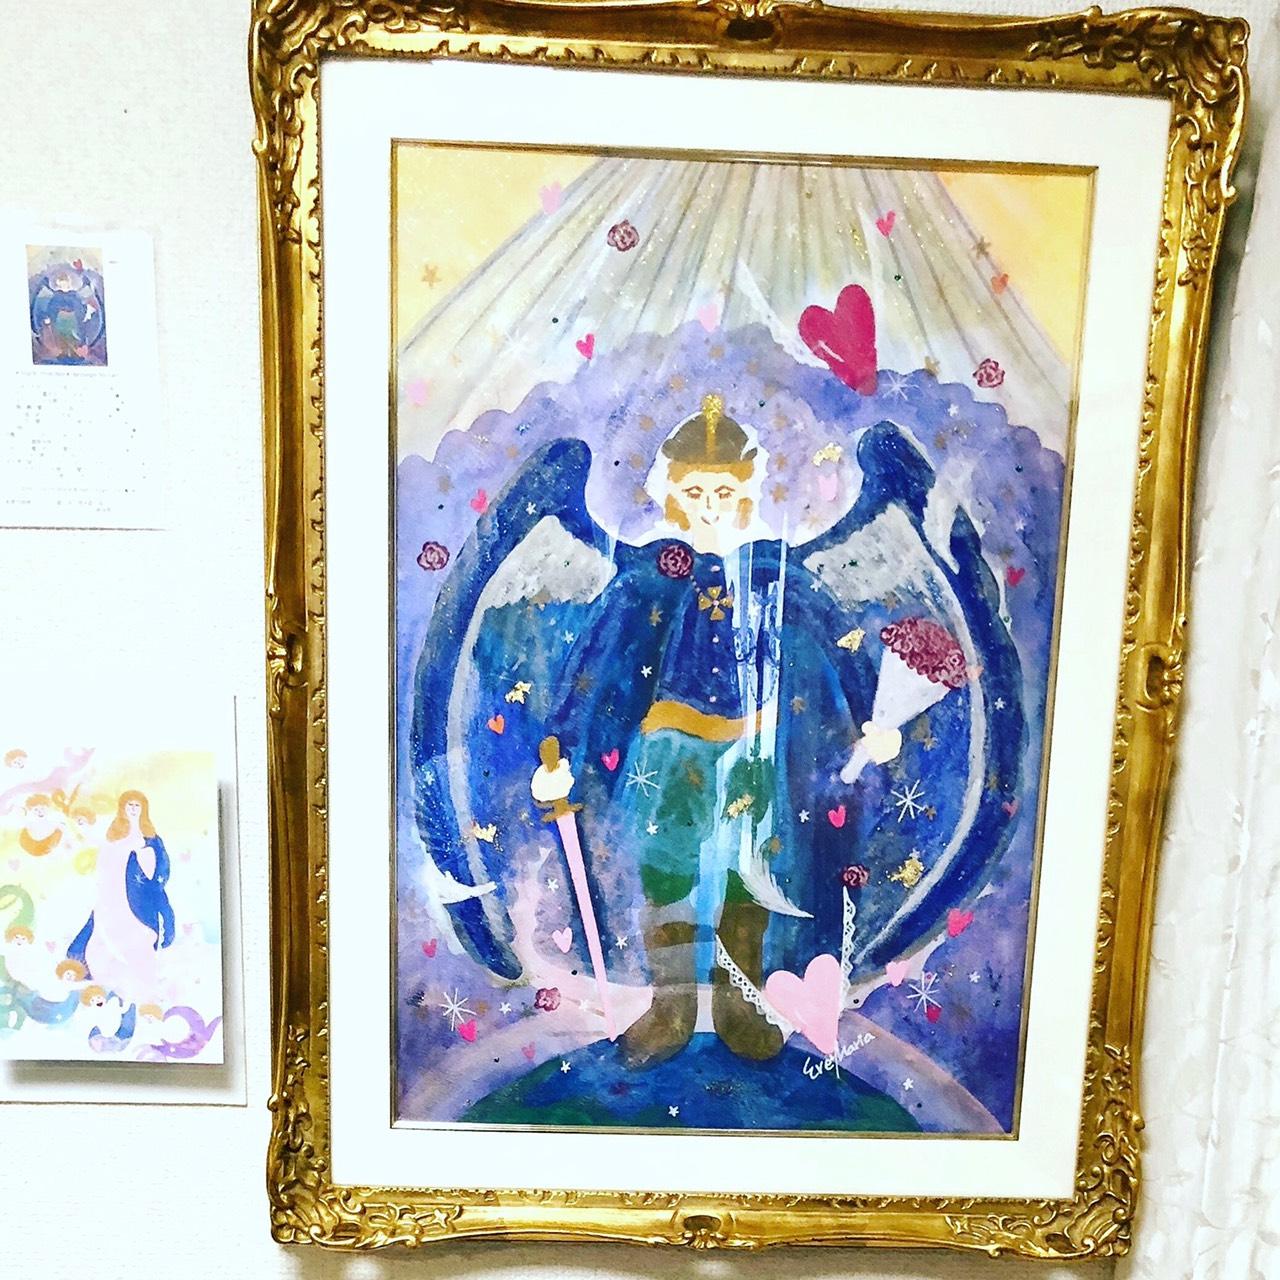 *Angelic Protection* Archangel Michael*